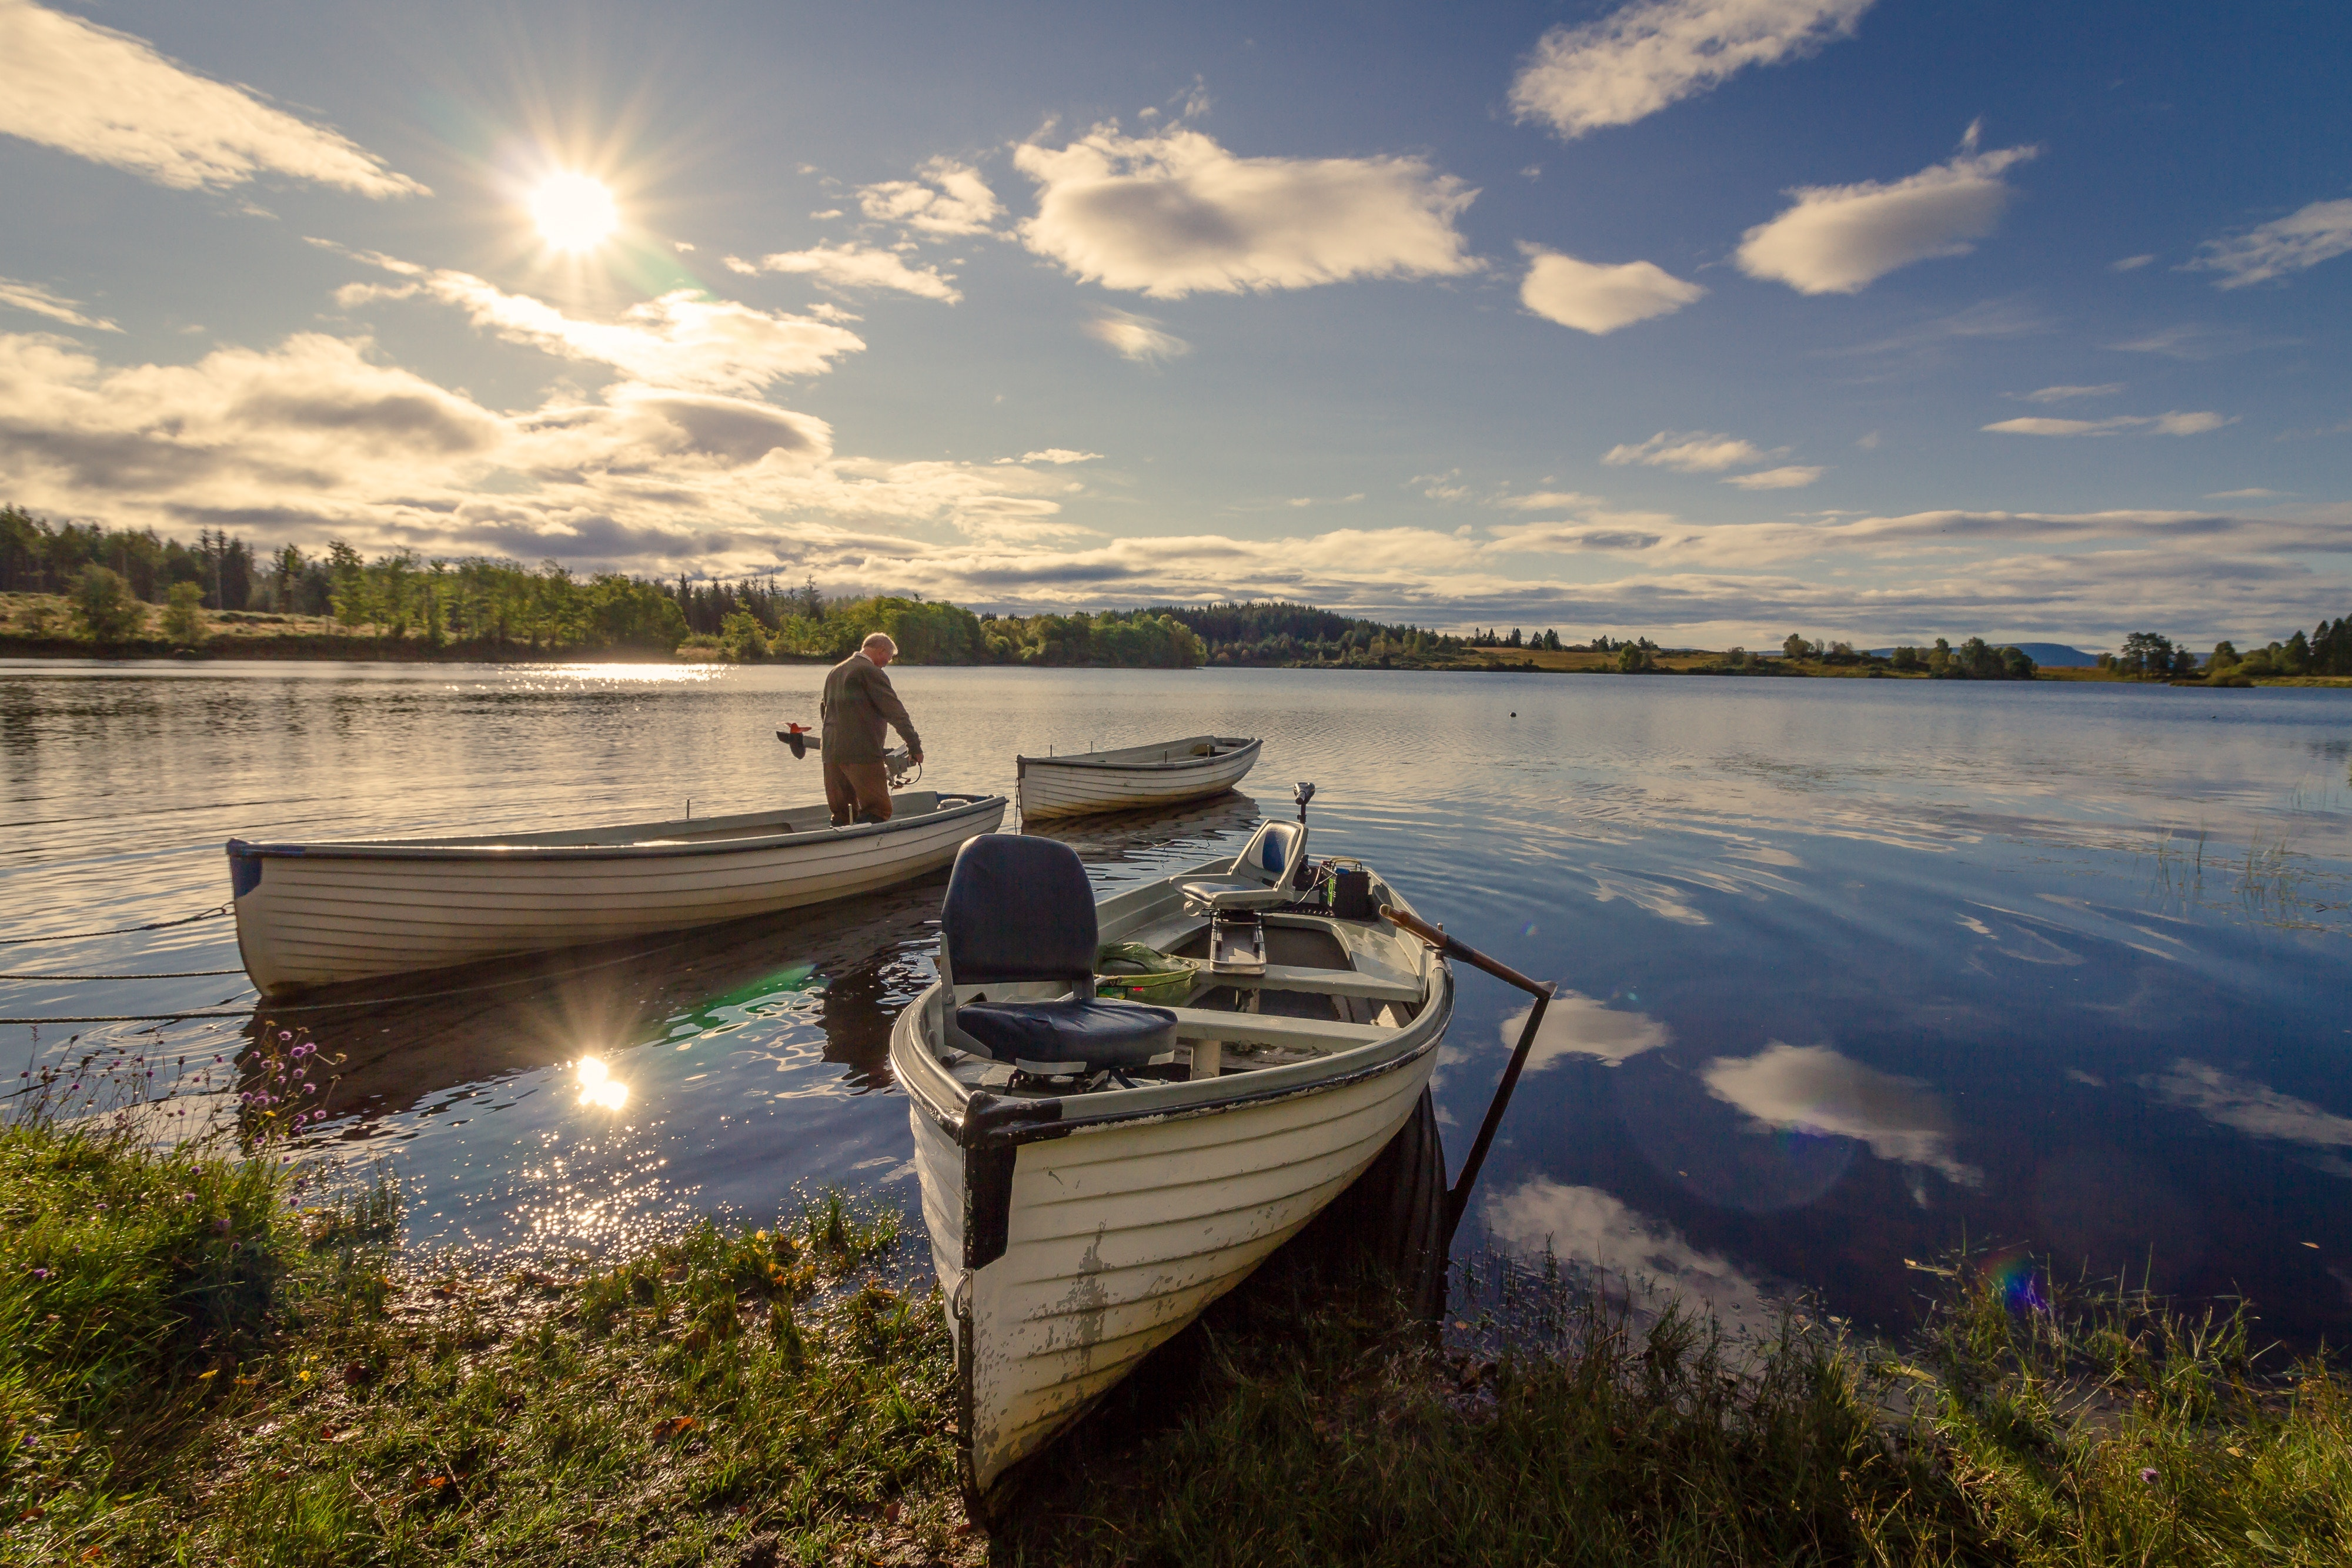 Fisherman on White Wooden Boat, Boats, Scenery, Water, Vehicle, HQ Photo